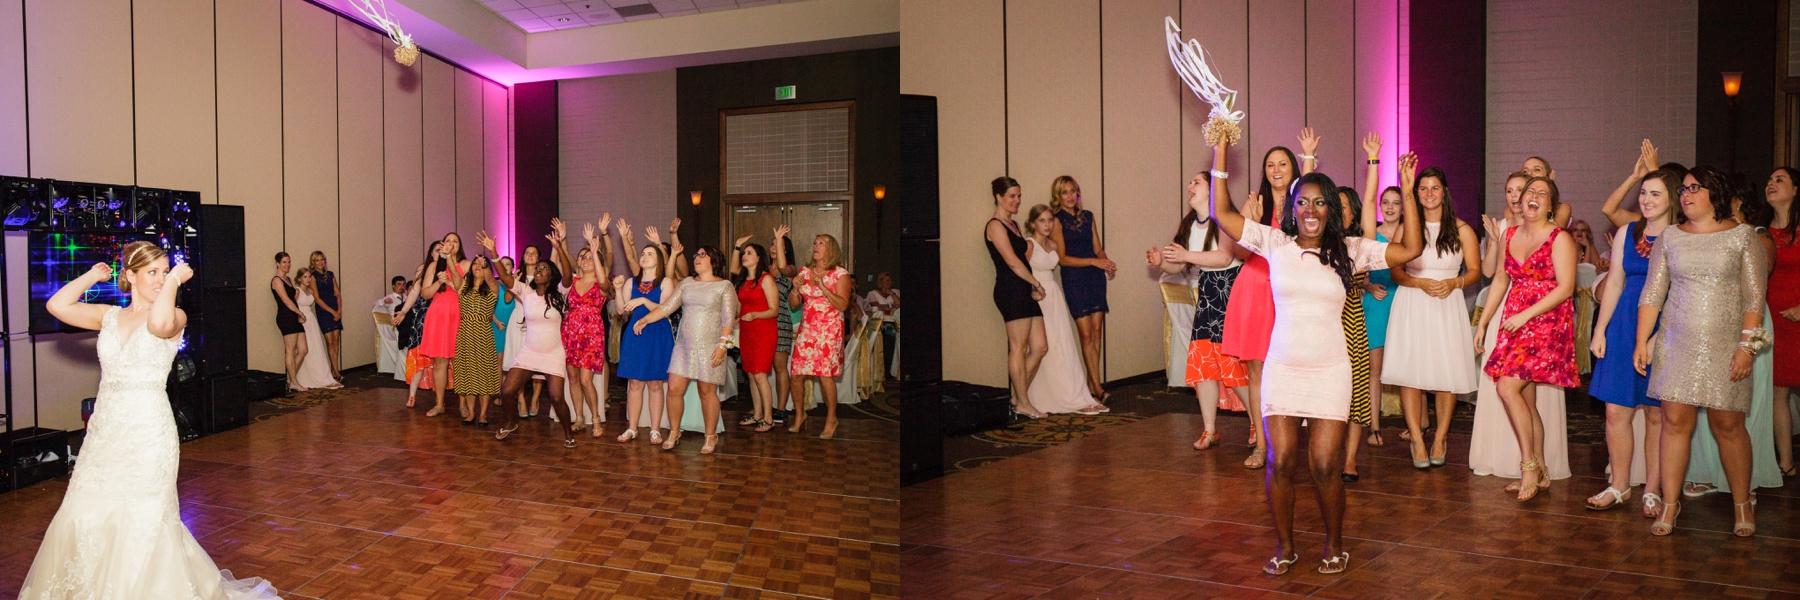 Ben_Jillian_Midland_Baycity_Wedding_0078.jpg